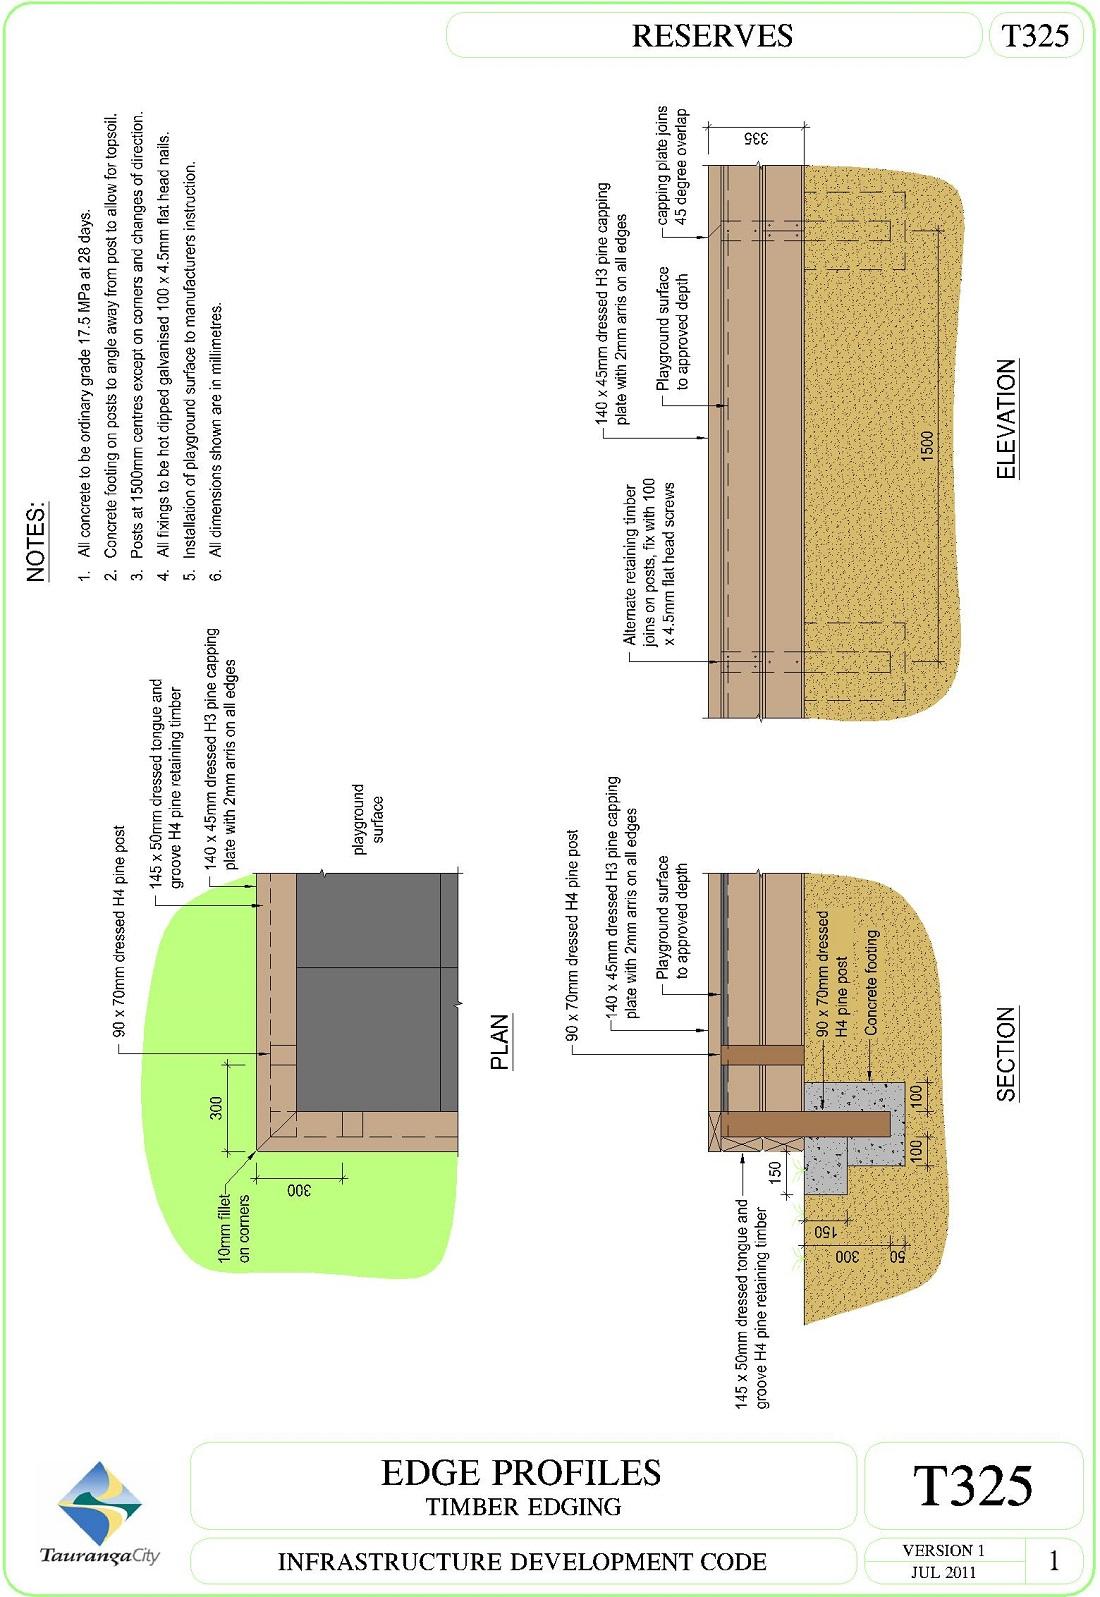 Edge Profiles - Timber Edging